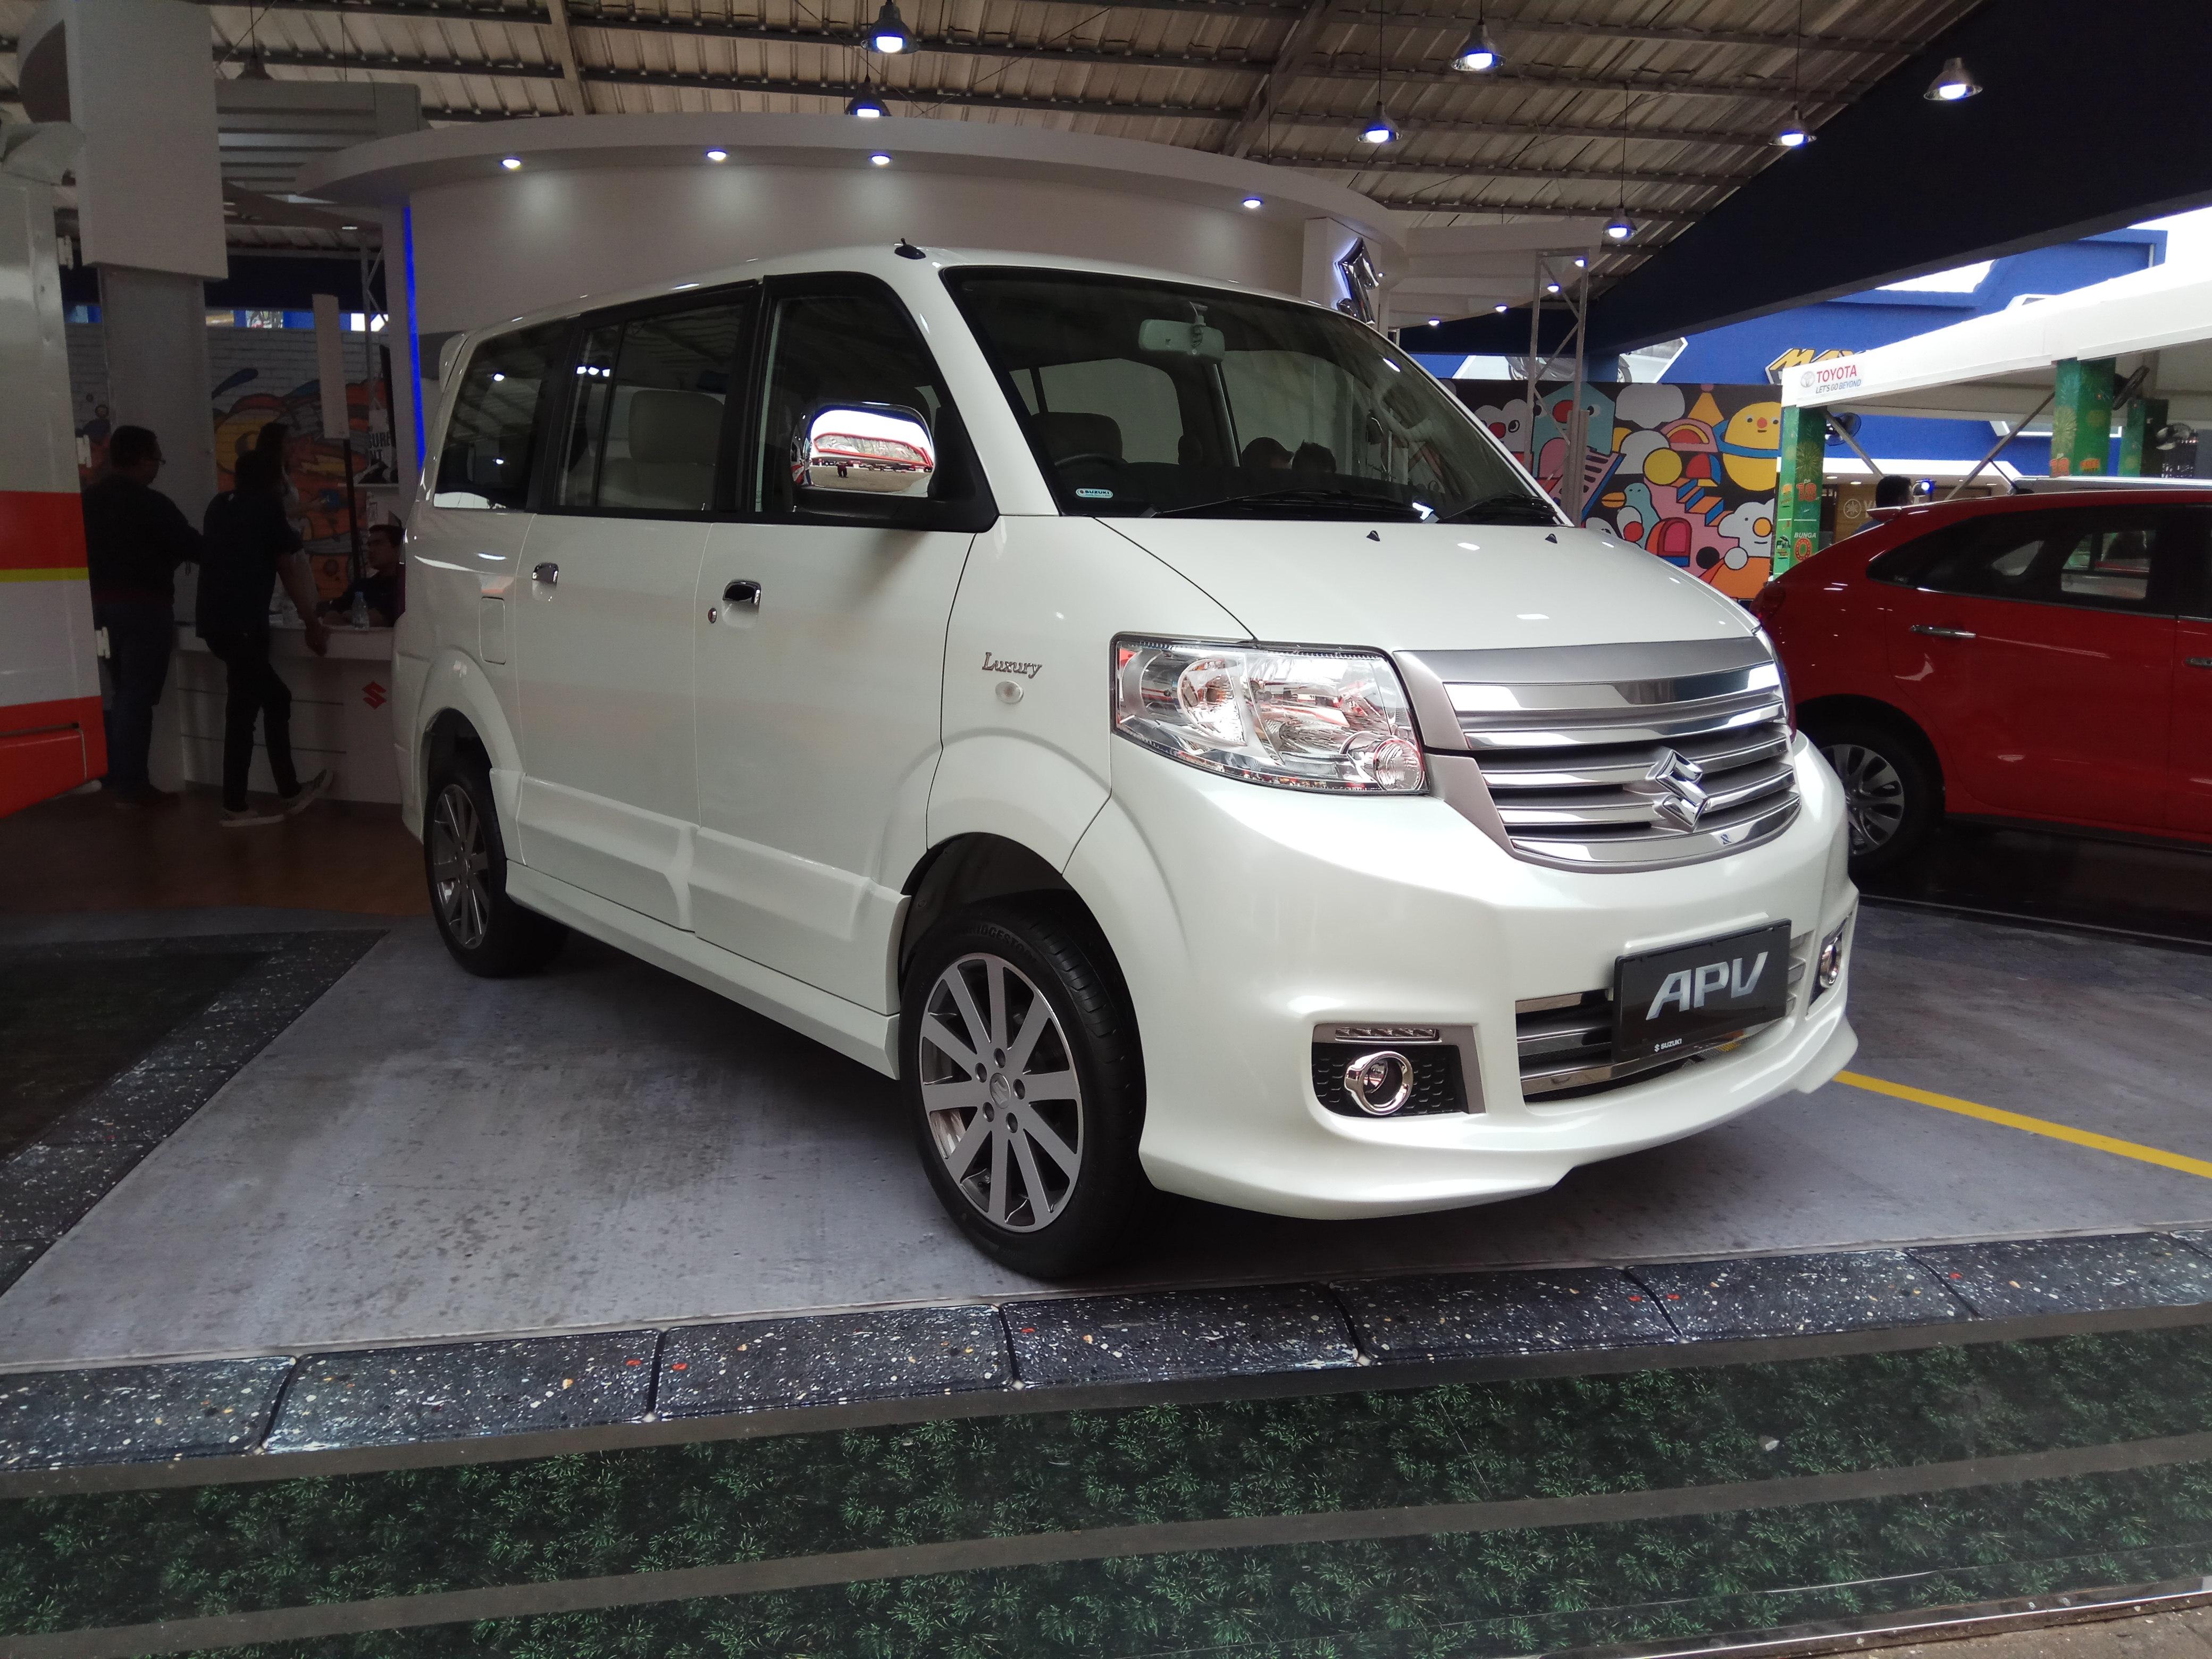 File:2019 Suzuki APV Arena Luxury, 2019 Jakarta Fair